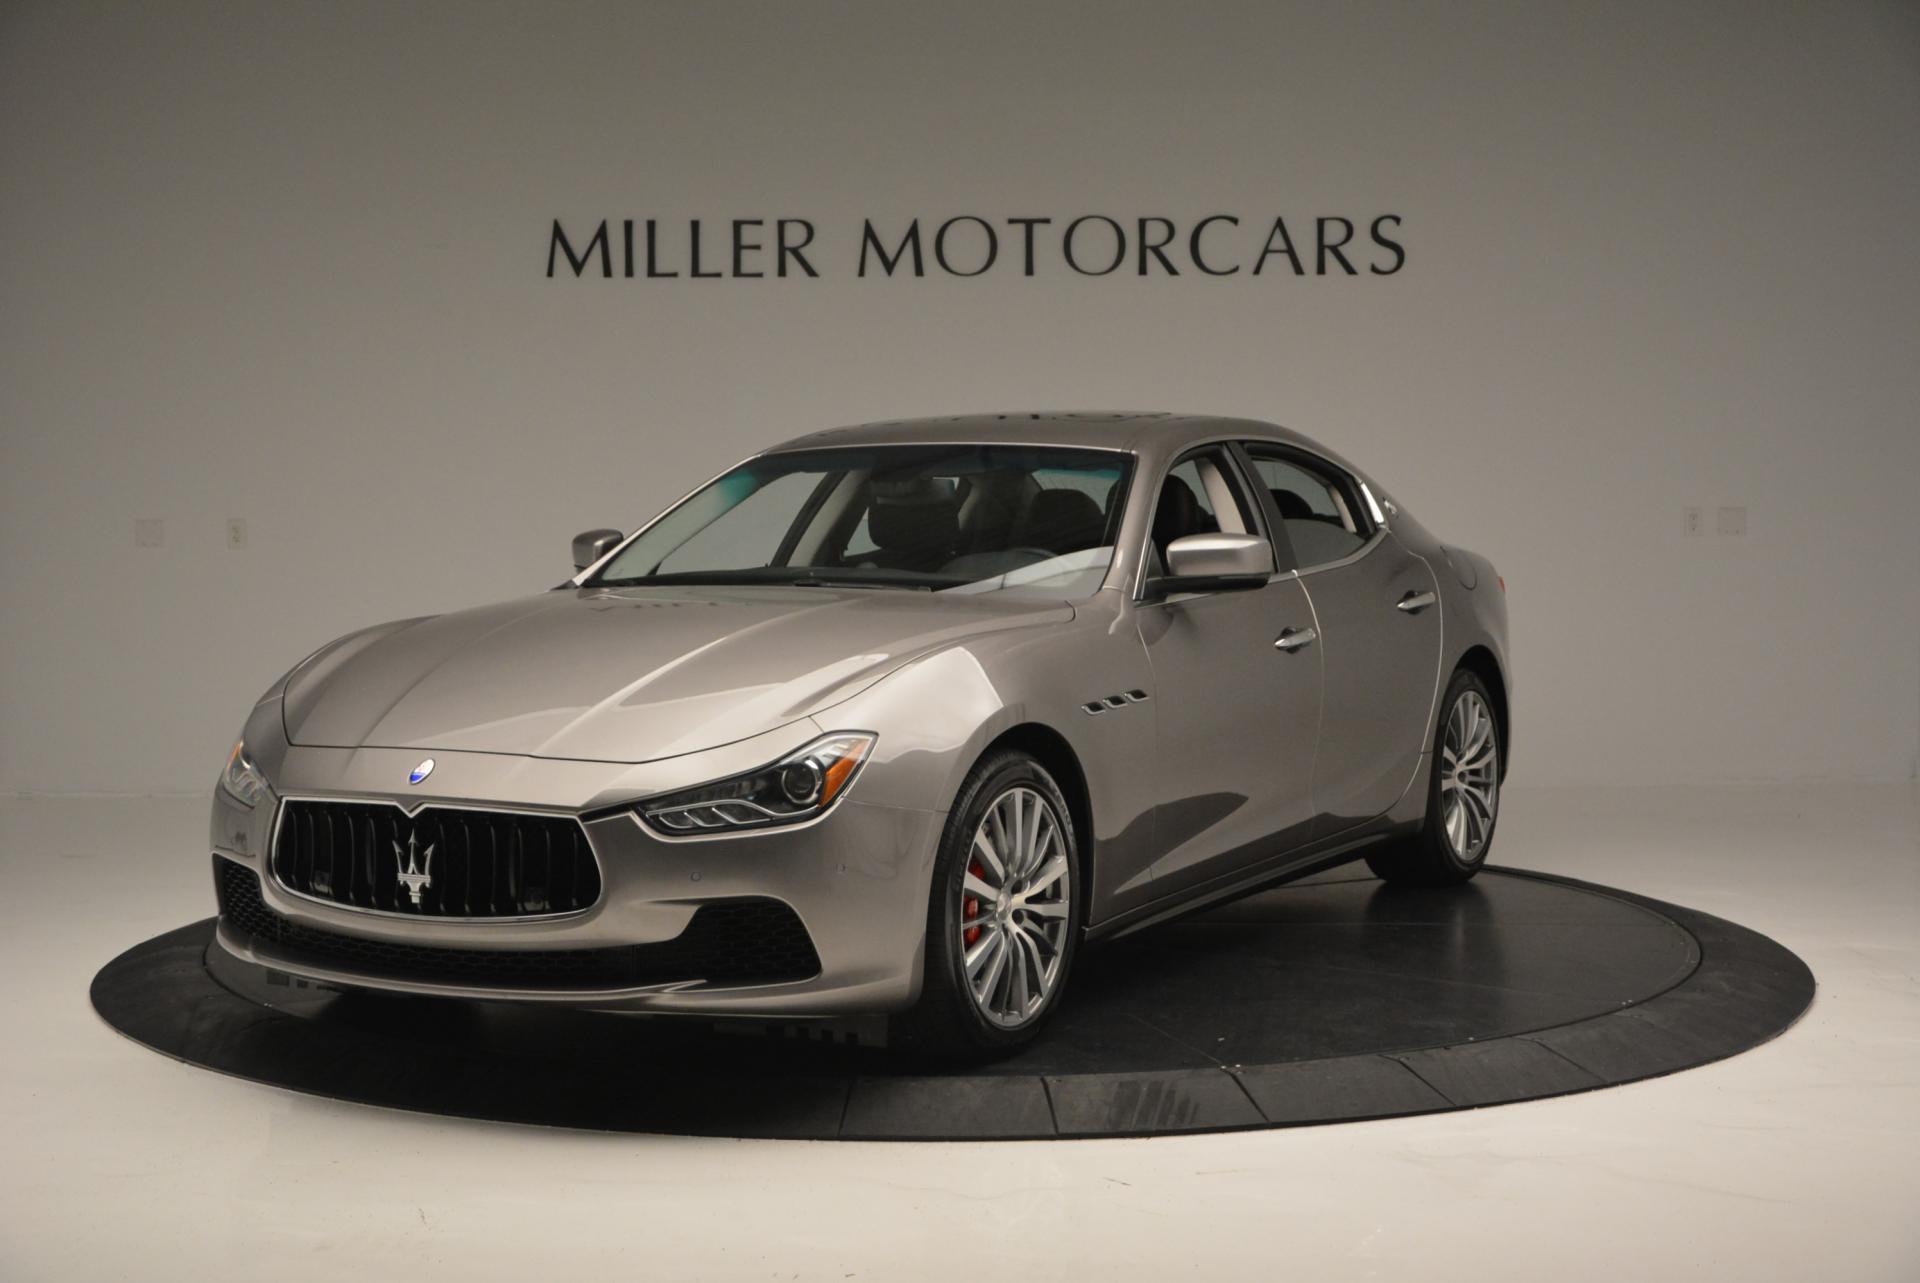 New 2016 Maserati Ghibli S Q4 For Sale In Greenwich, CT 51_main